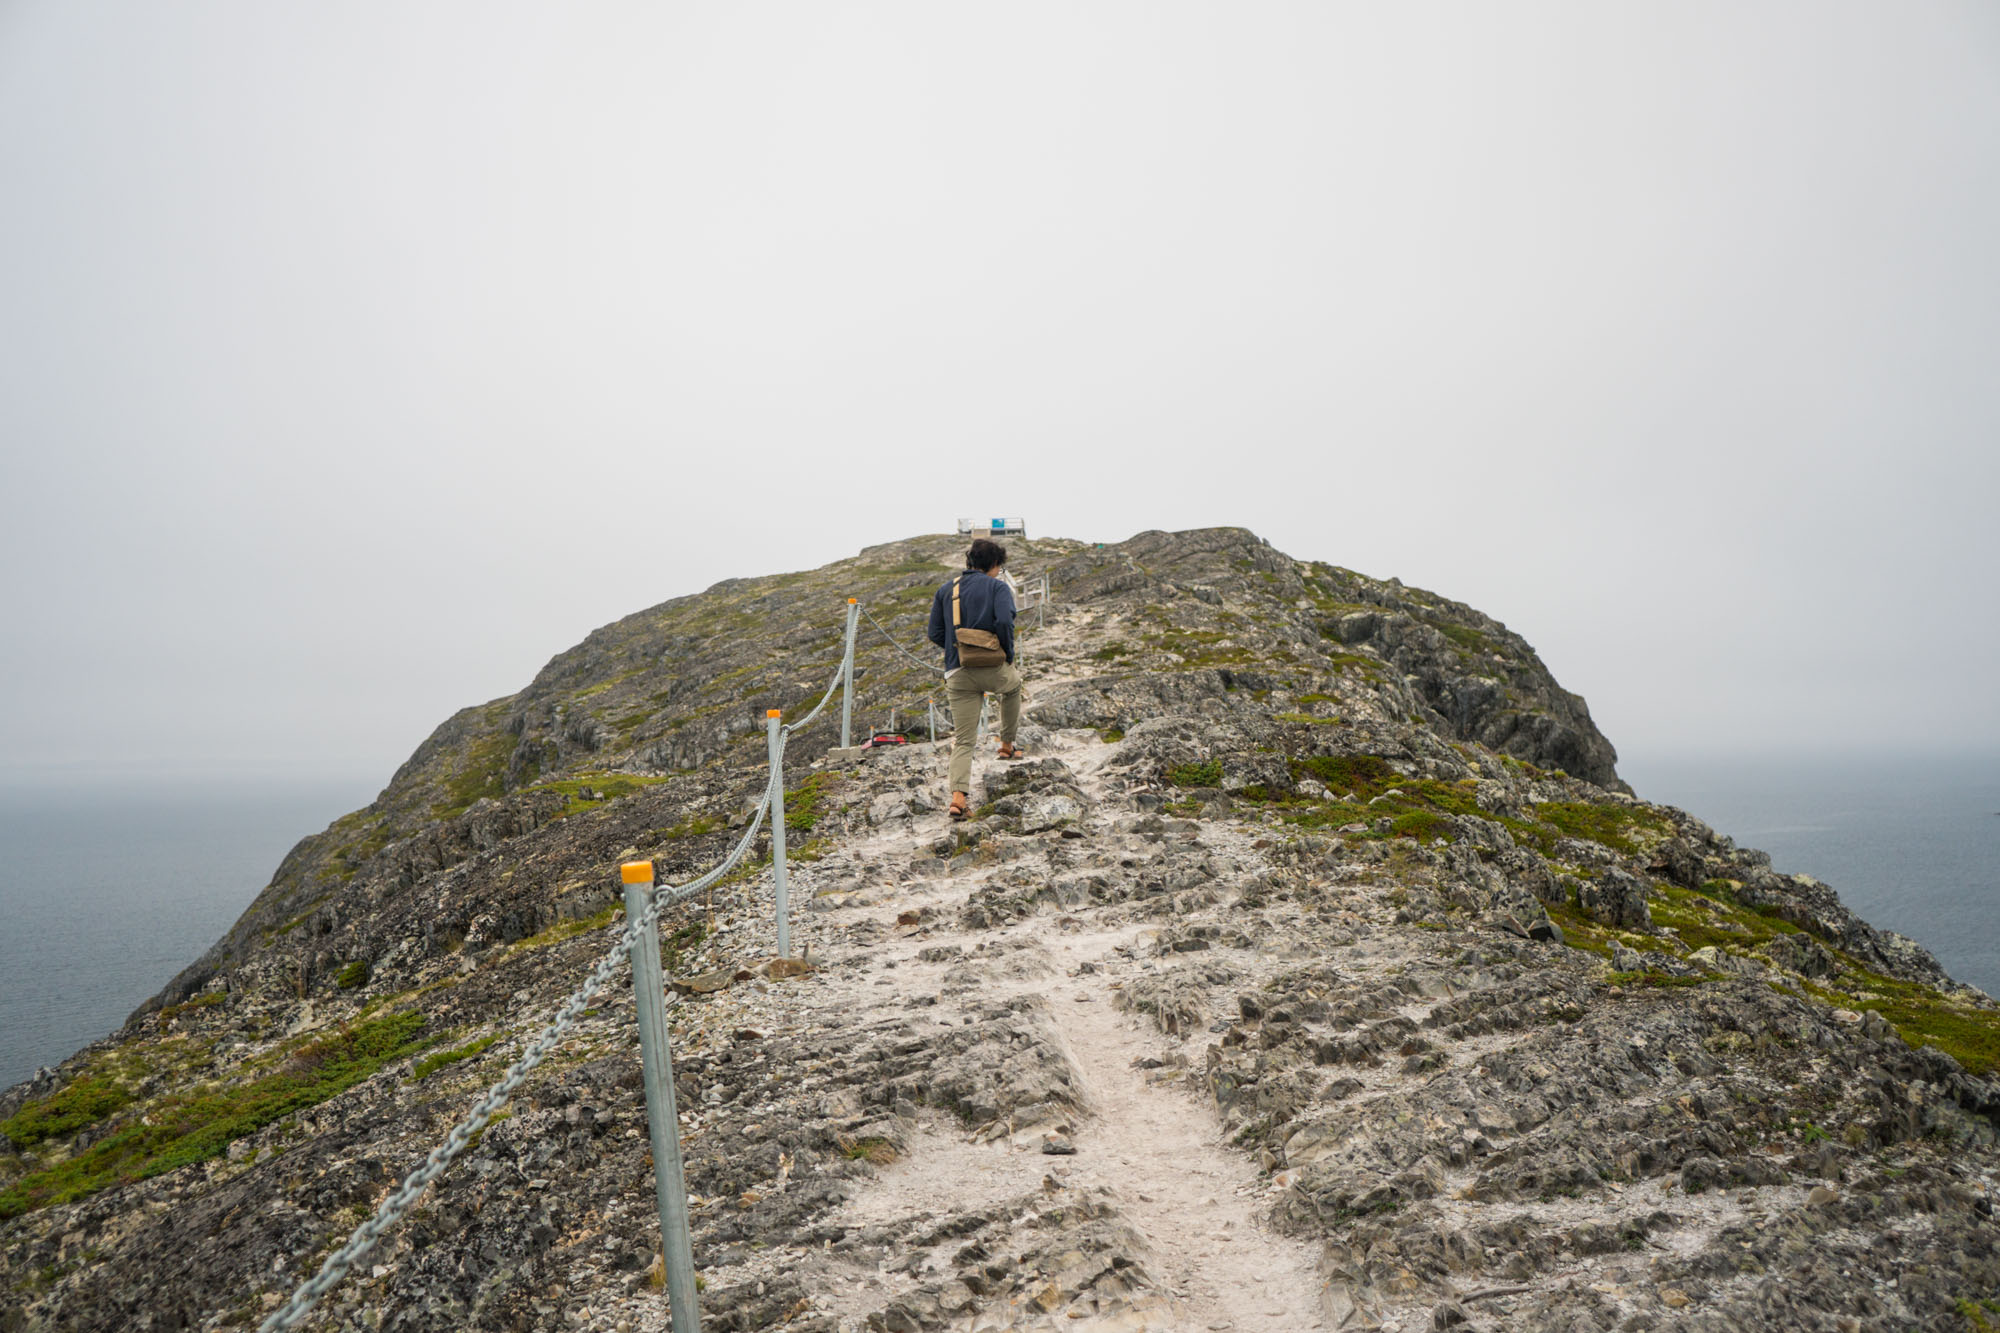 Owen nearing the top of Brimstone head